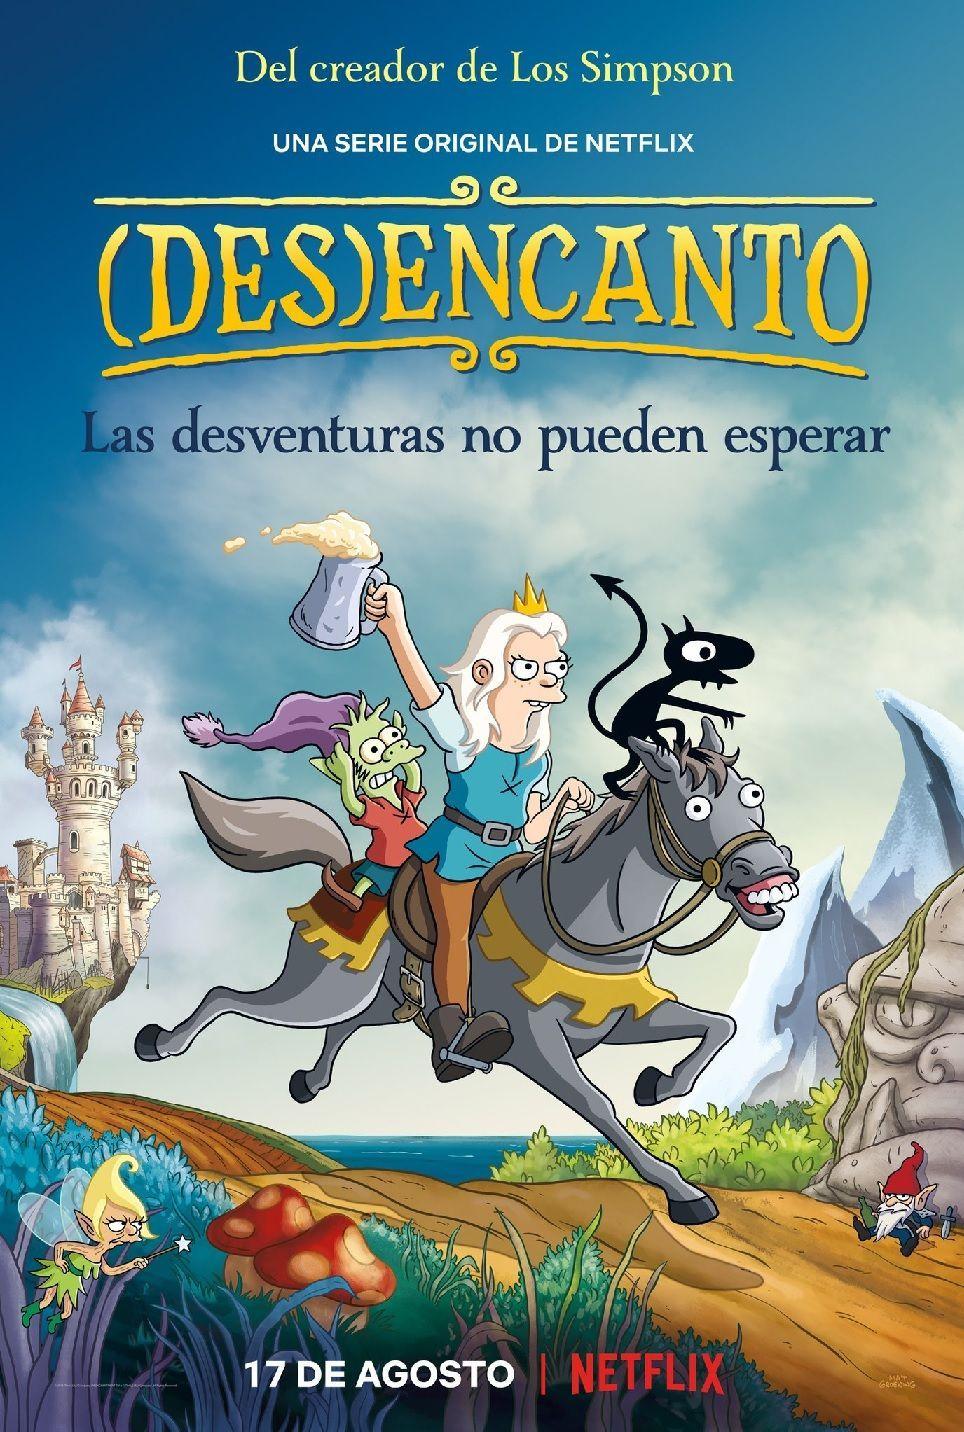 Ver Serie Desencanto Disenchantment Online Hd Entrepeliculasyseries Matt Groening Netflix The Simpsons